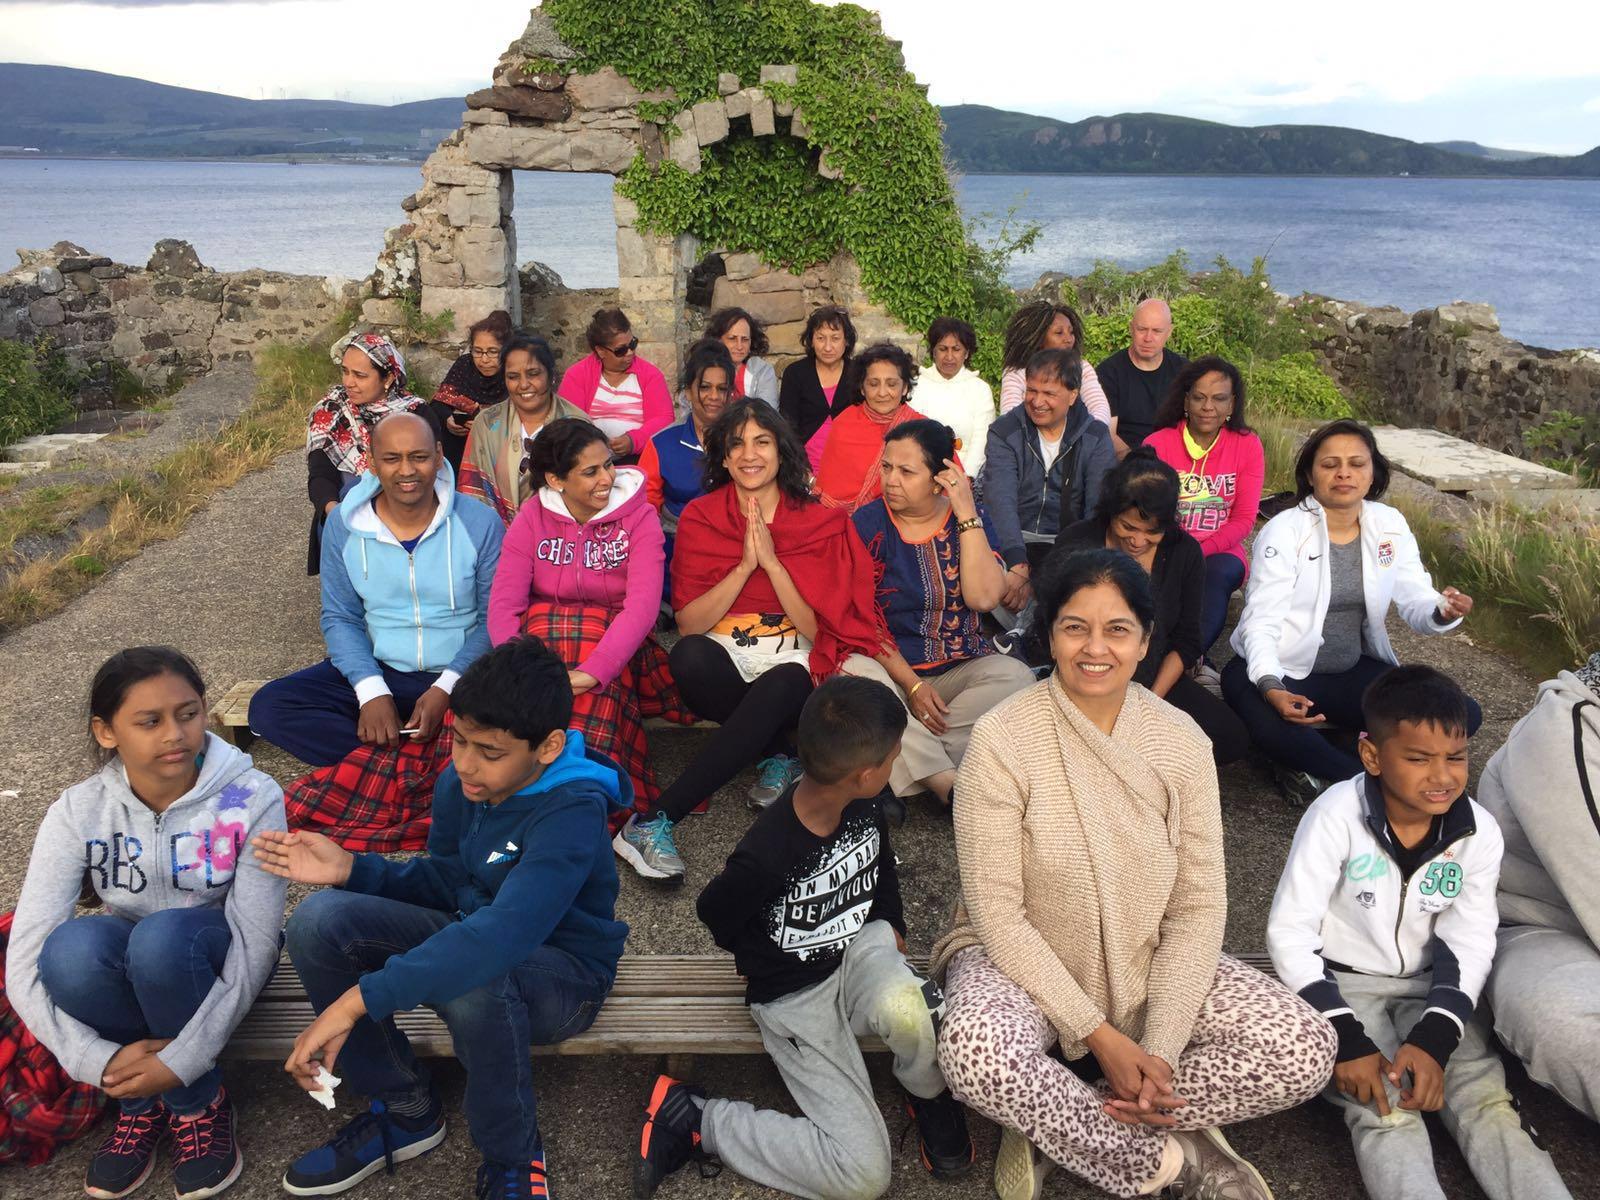 Little Cumbrae Island 2016